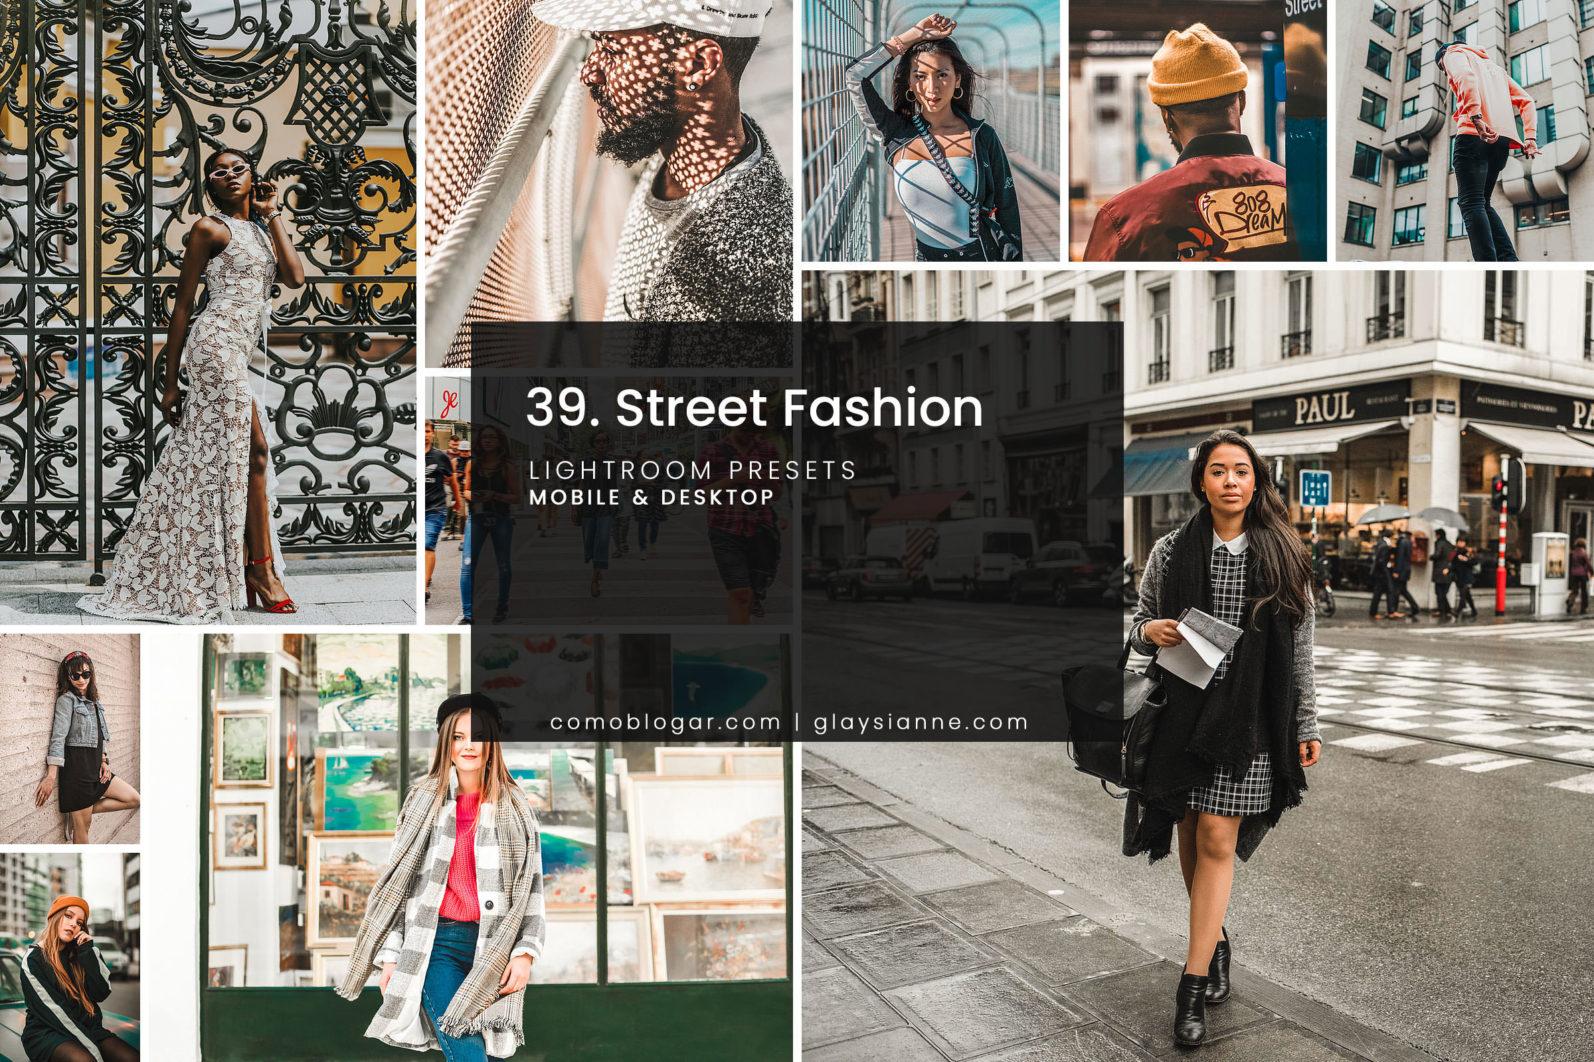 39. Street Fashion - 39.STREETFASHION 1 -